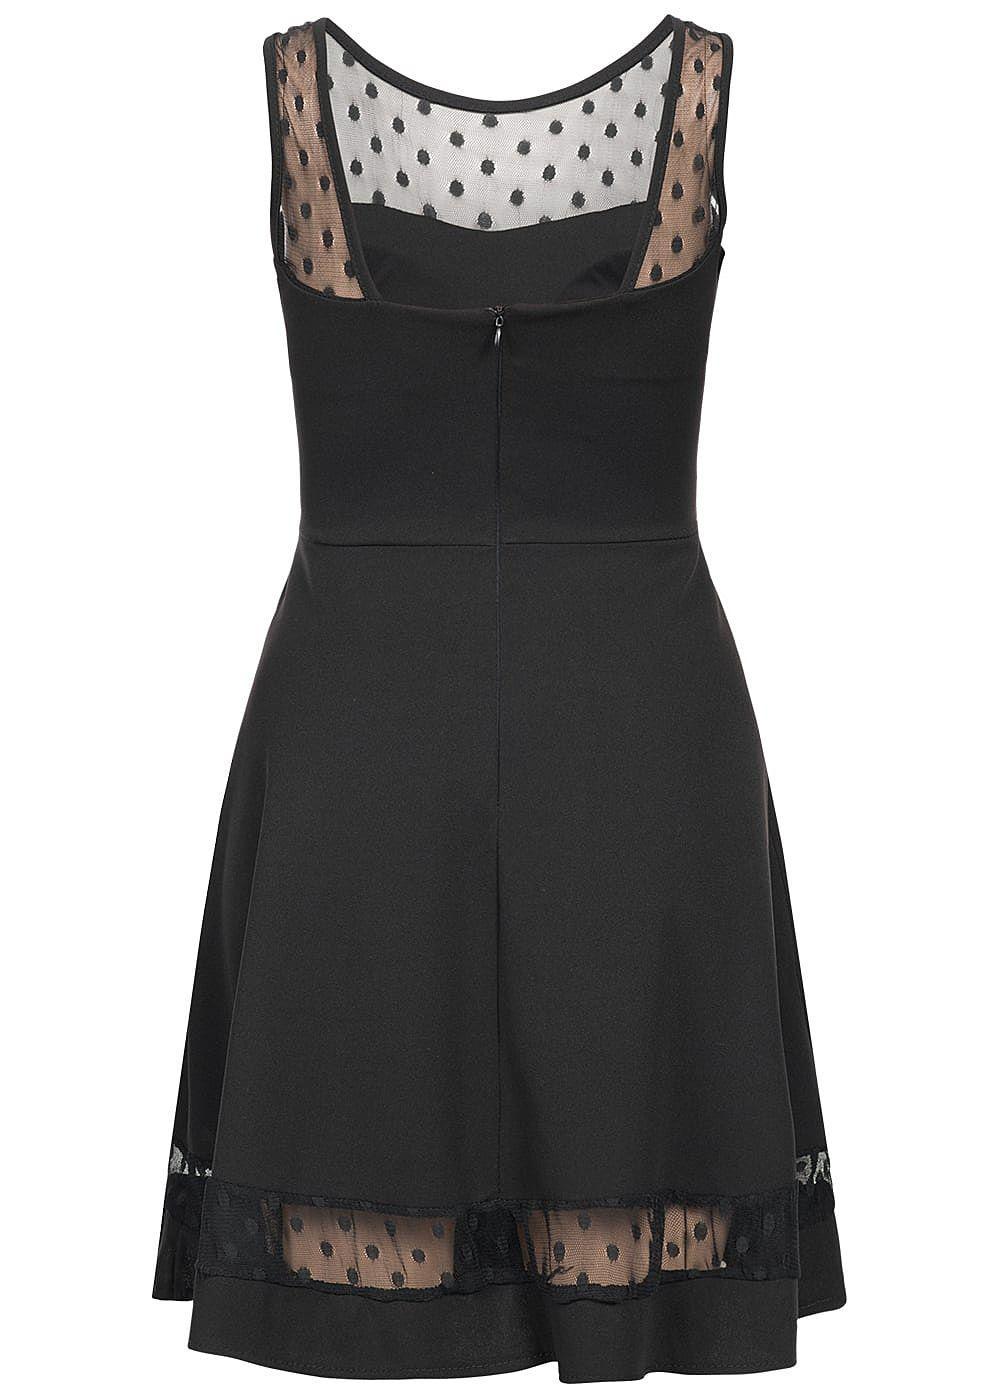 styleboom fashion damen mini chiffon kleid punkte muster brustpads schwarz 77onlineshop. Black Bedroom Furniture Sets. Home Design Ideas